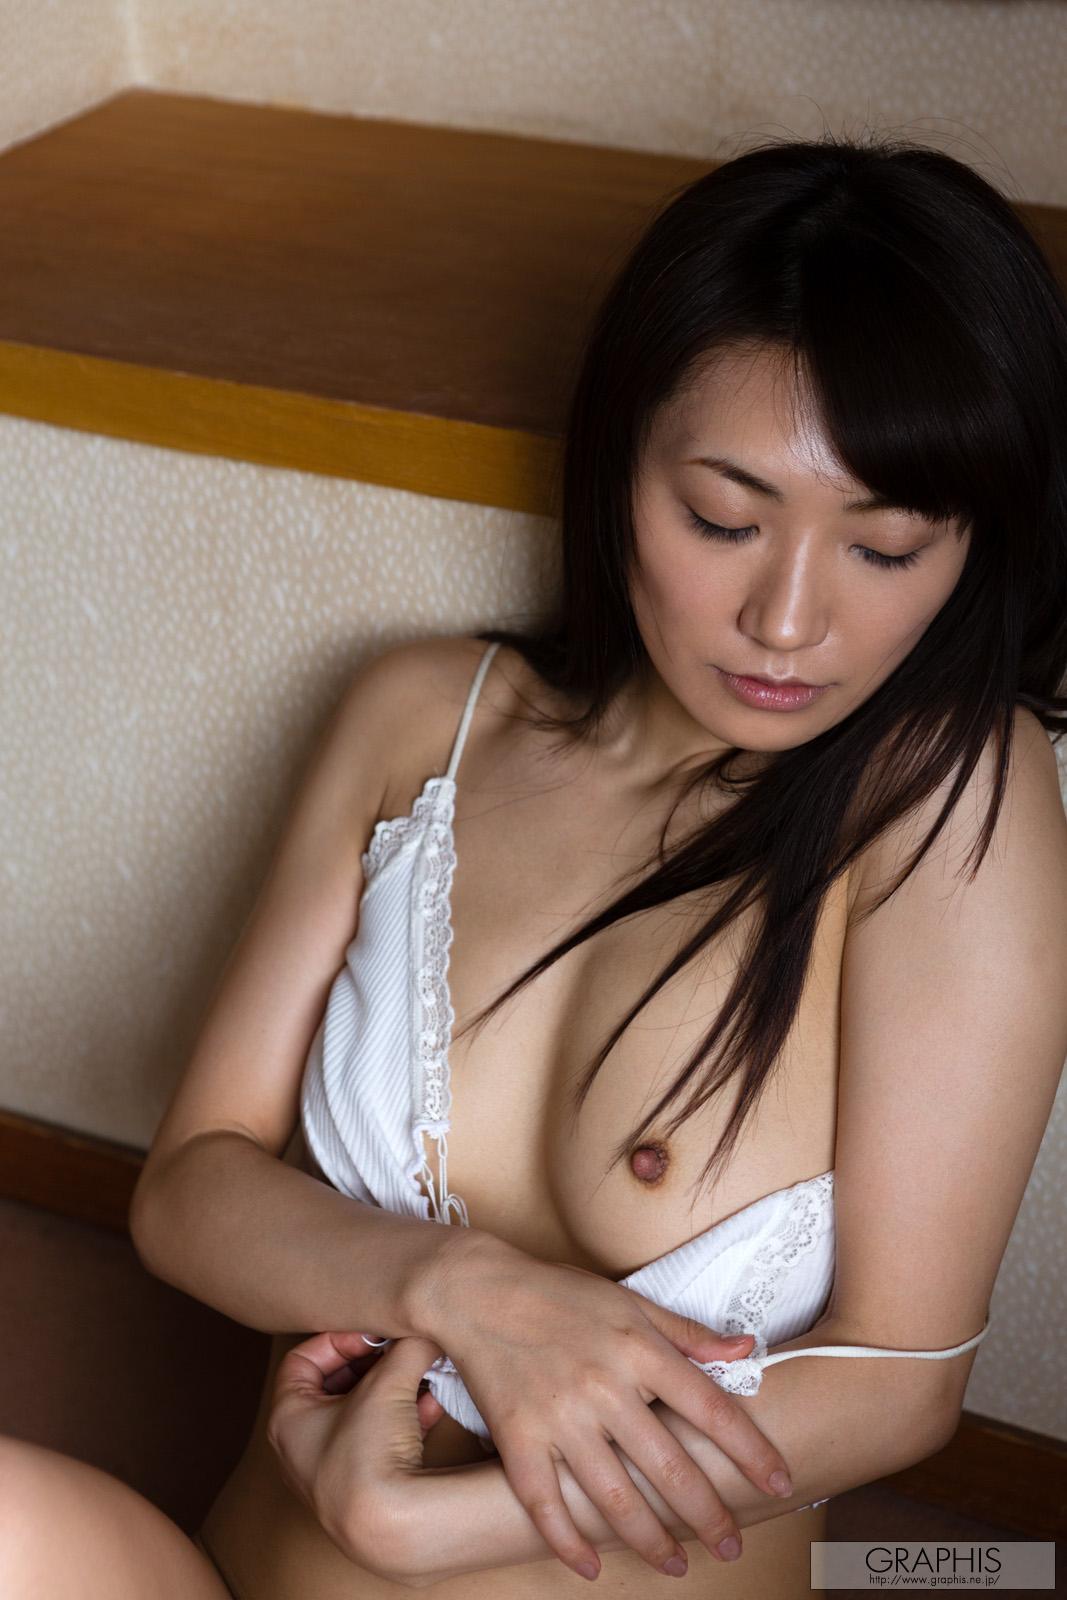 image http://scanlover.com/assets/images/272-W5LDOqKFMdQ4QsqF.jpeg